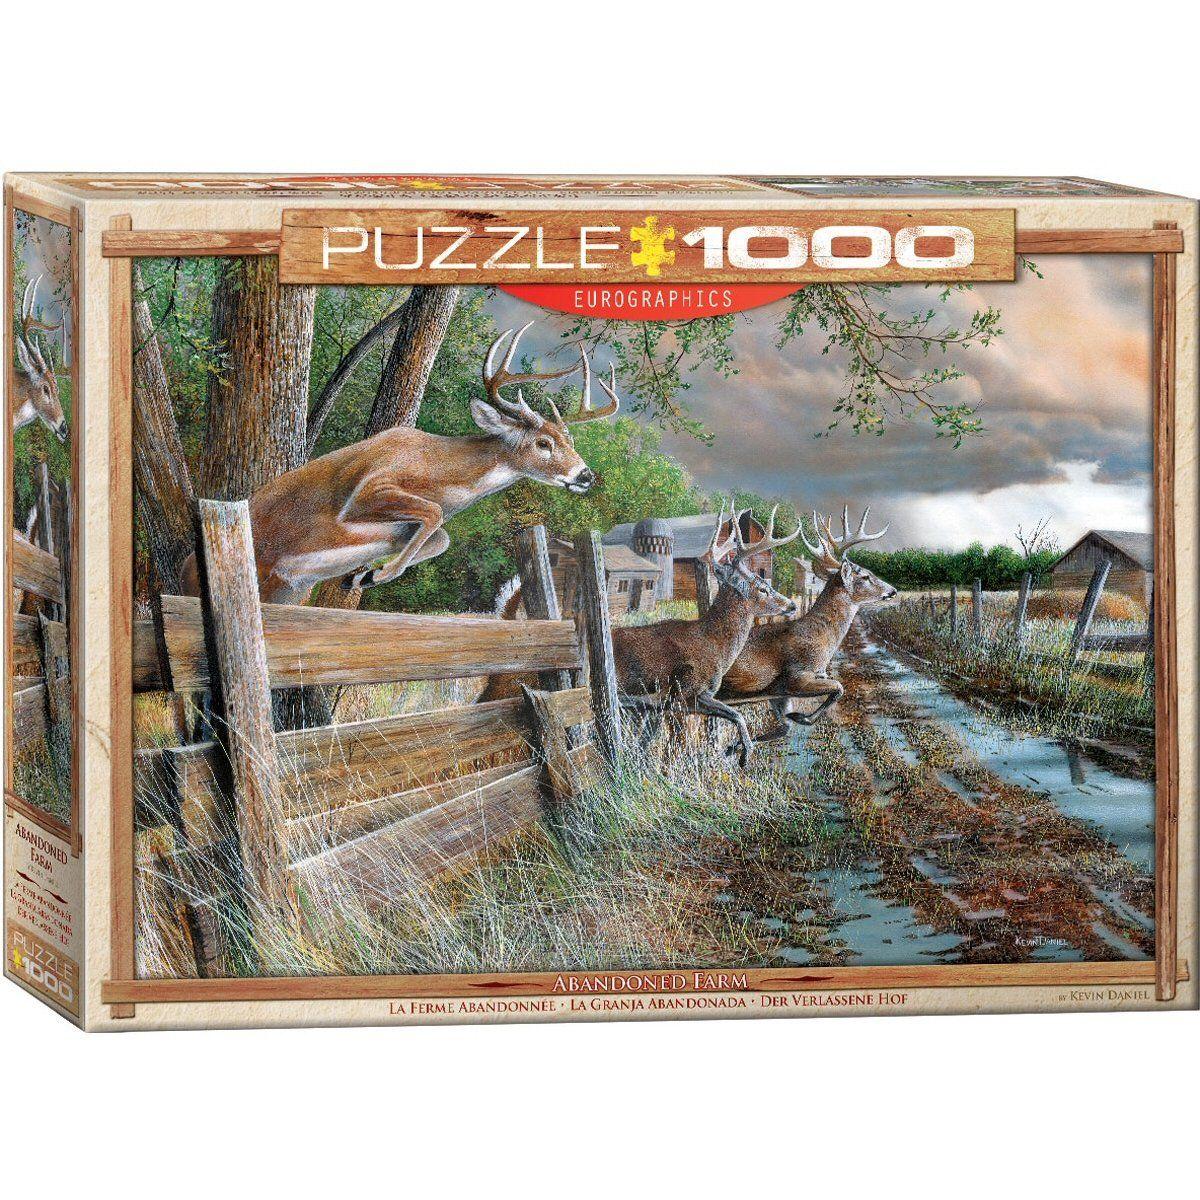 EuroGraphics Double Trouble 1000 Piece Puzzle